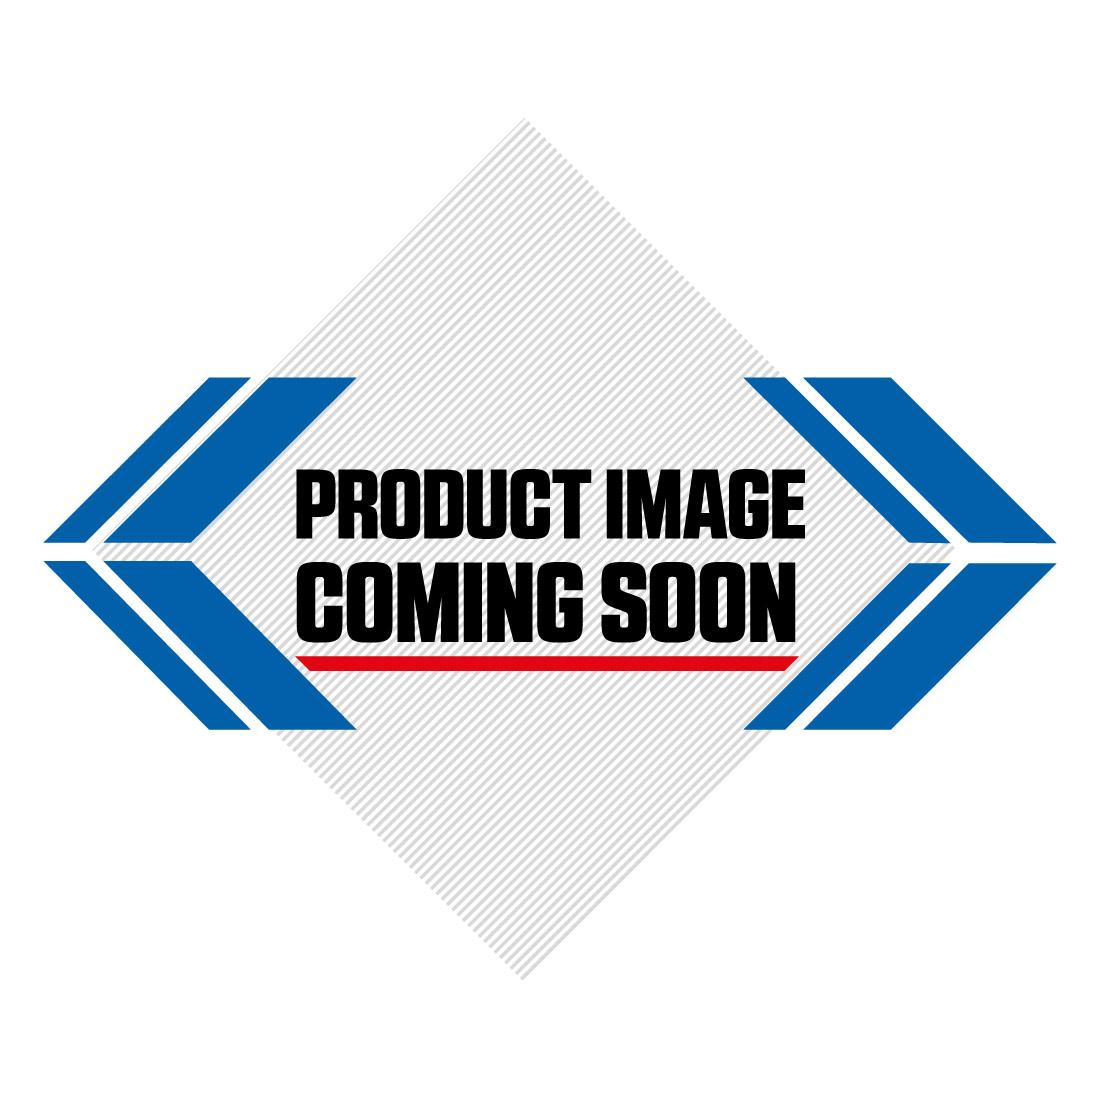 Suzuki Plastic Kit RMZ 450 (2013) OEM Factory Image-4>